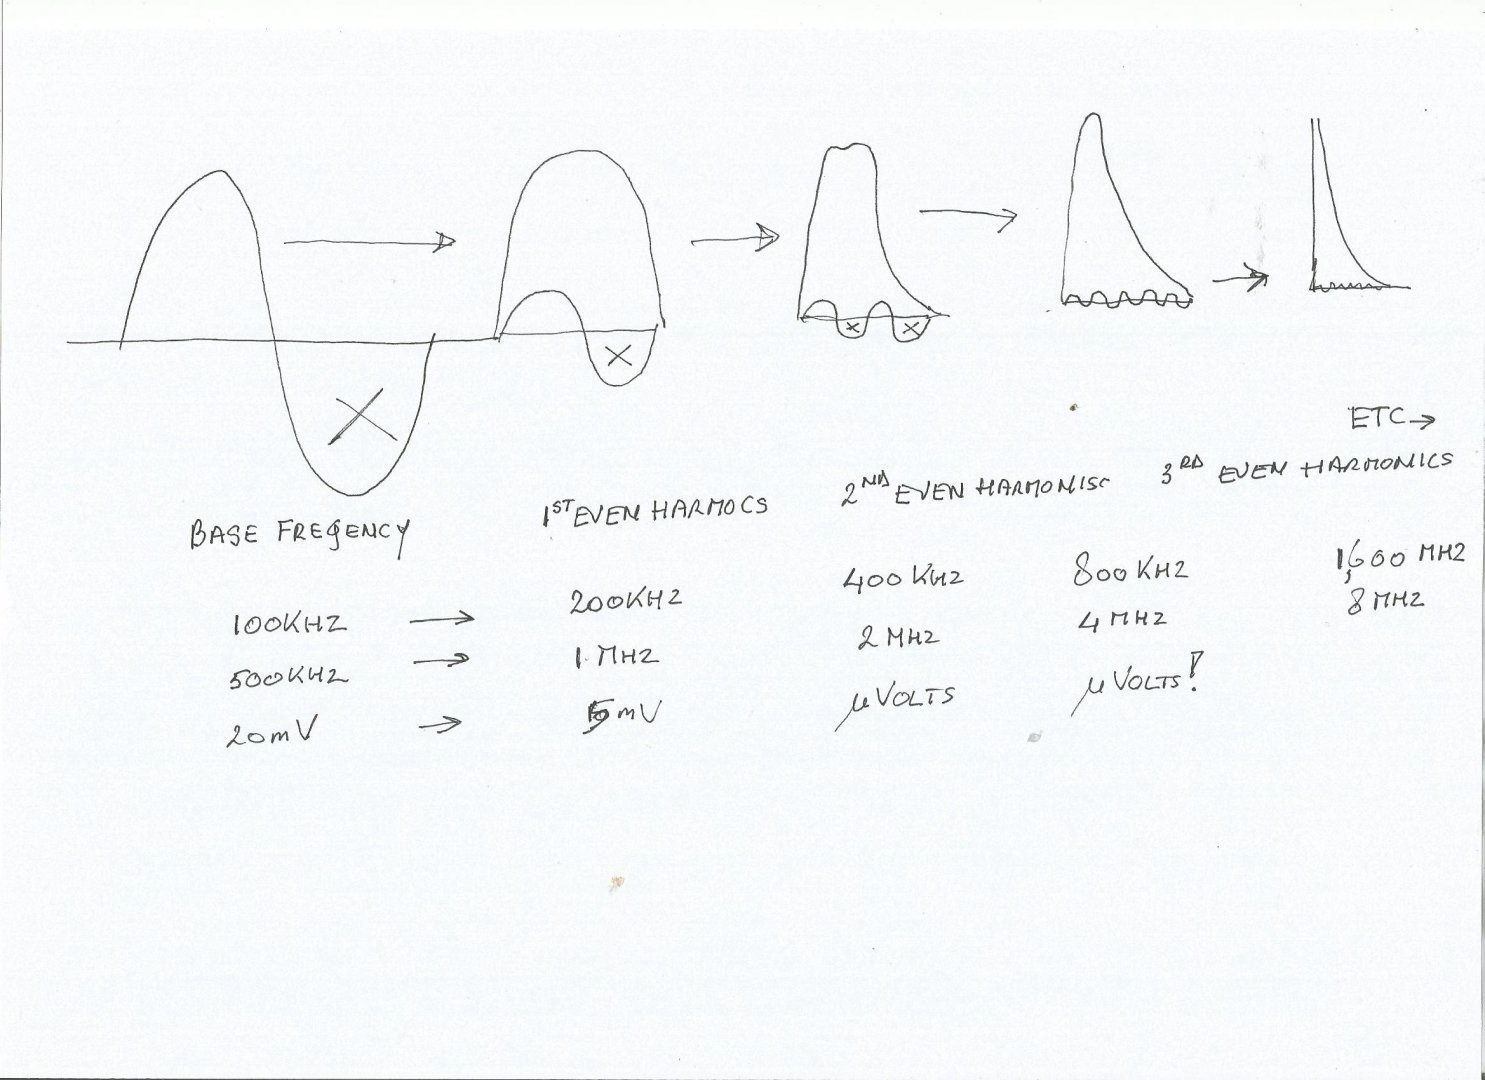 Boatdesign-sketch.jpg